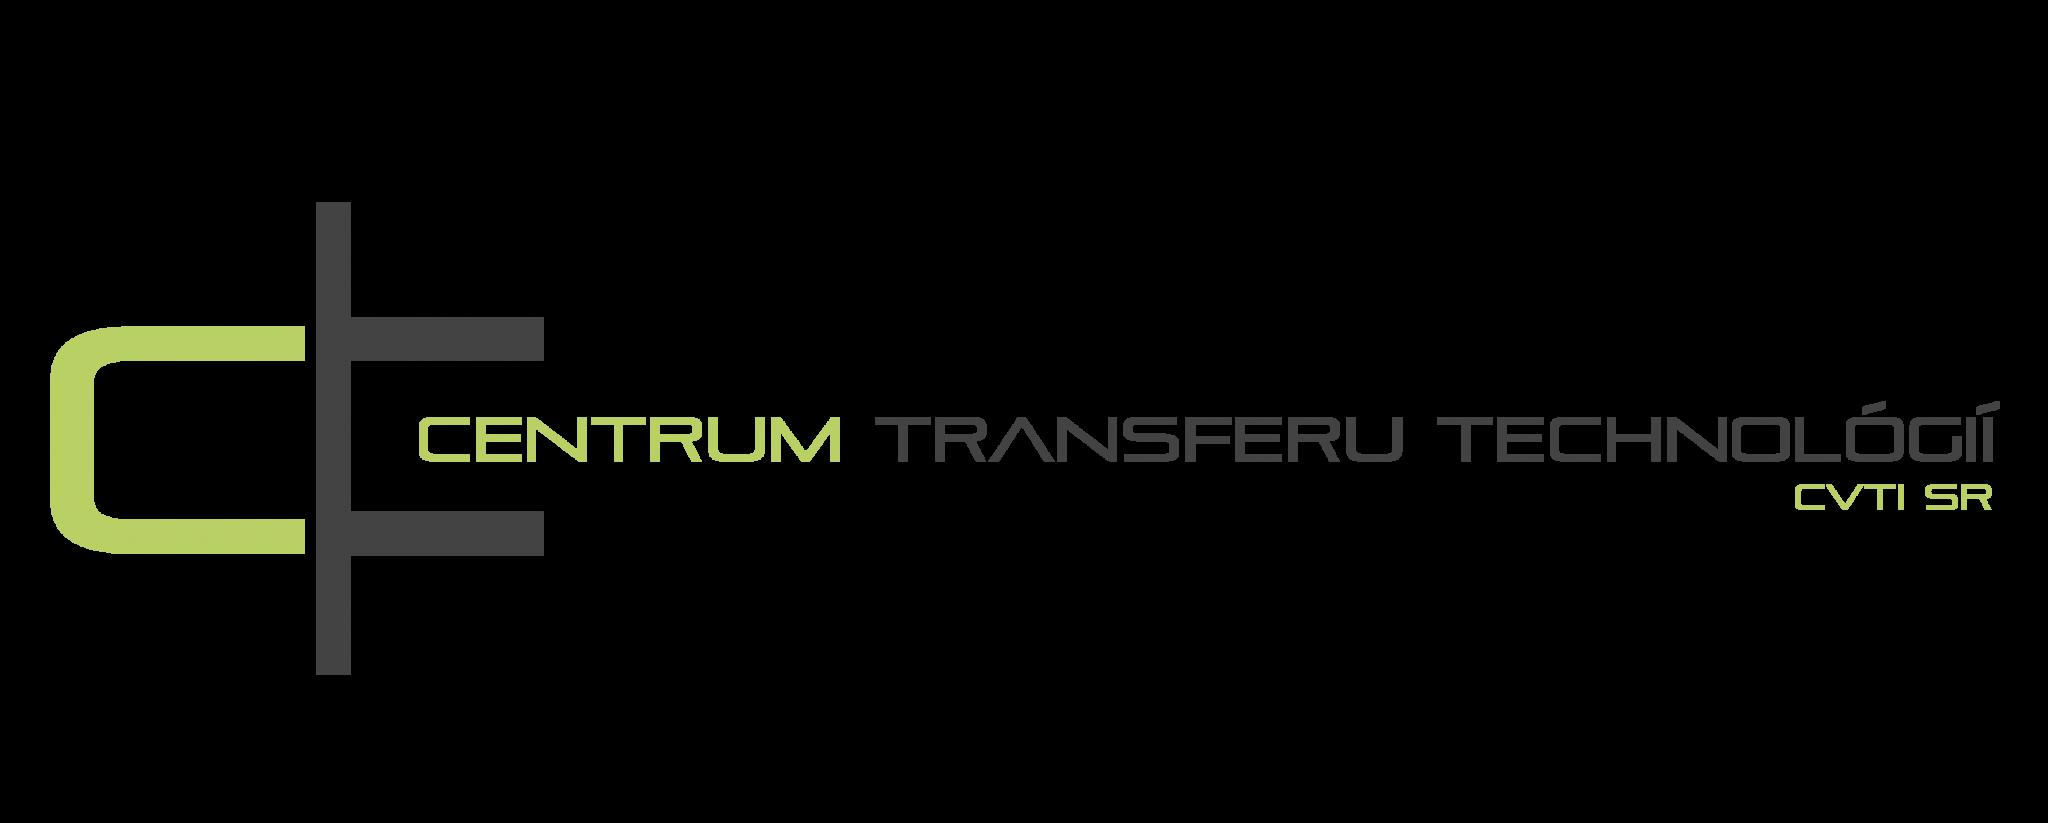 logo CTT CVTI SR